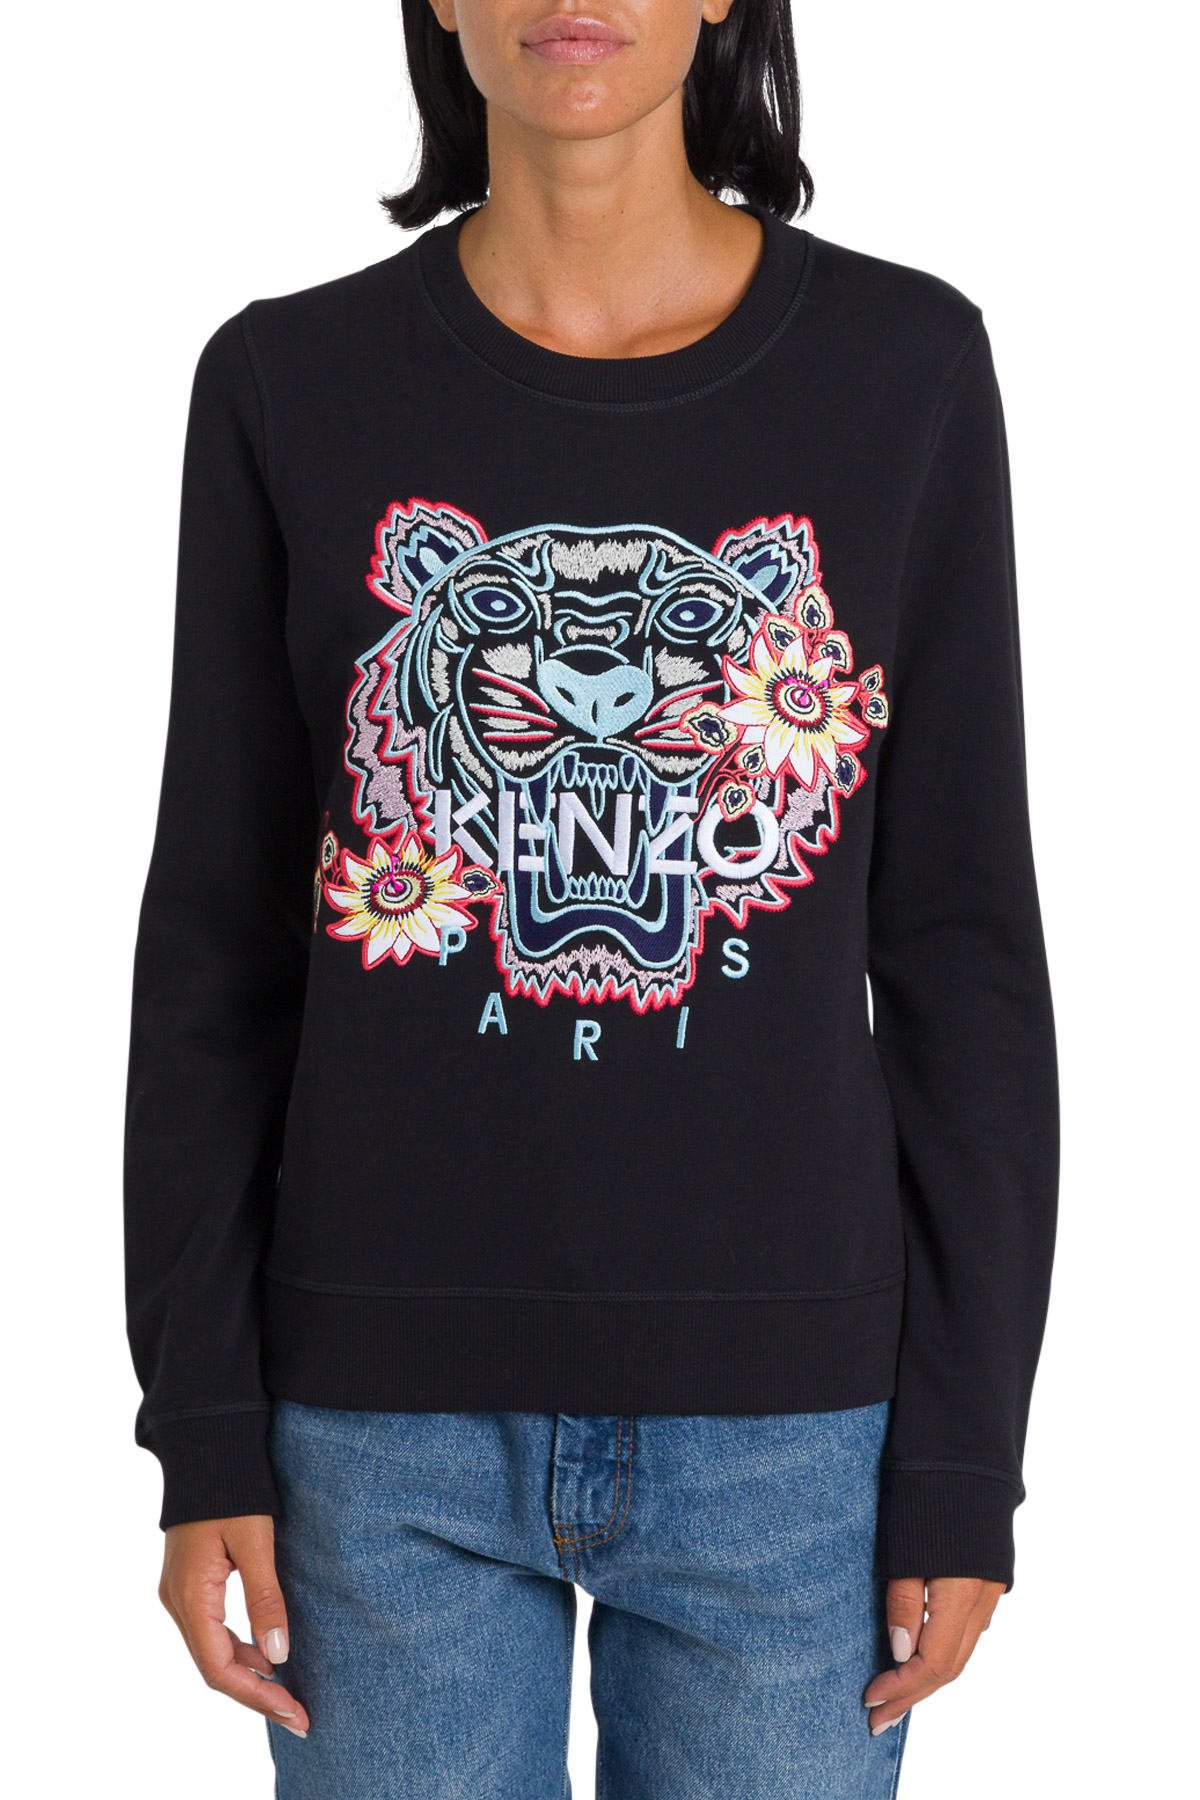 Kenzo Flower Tiger Sweatshirt